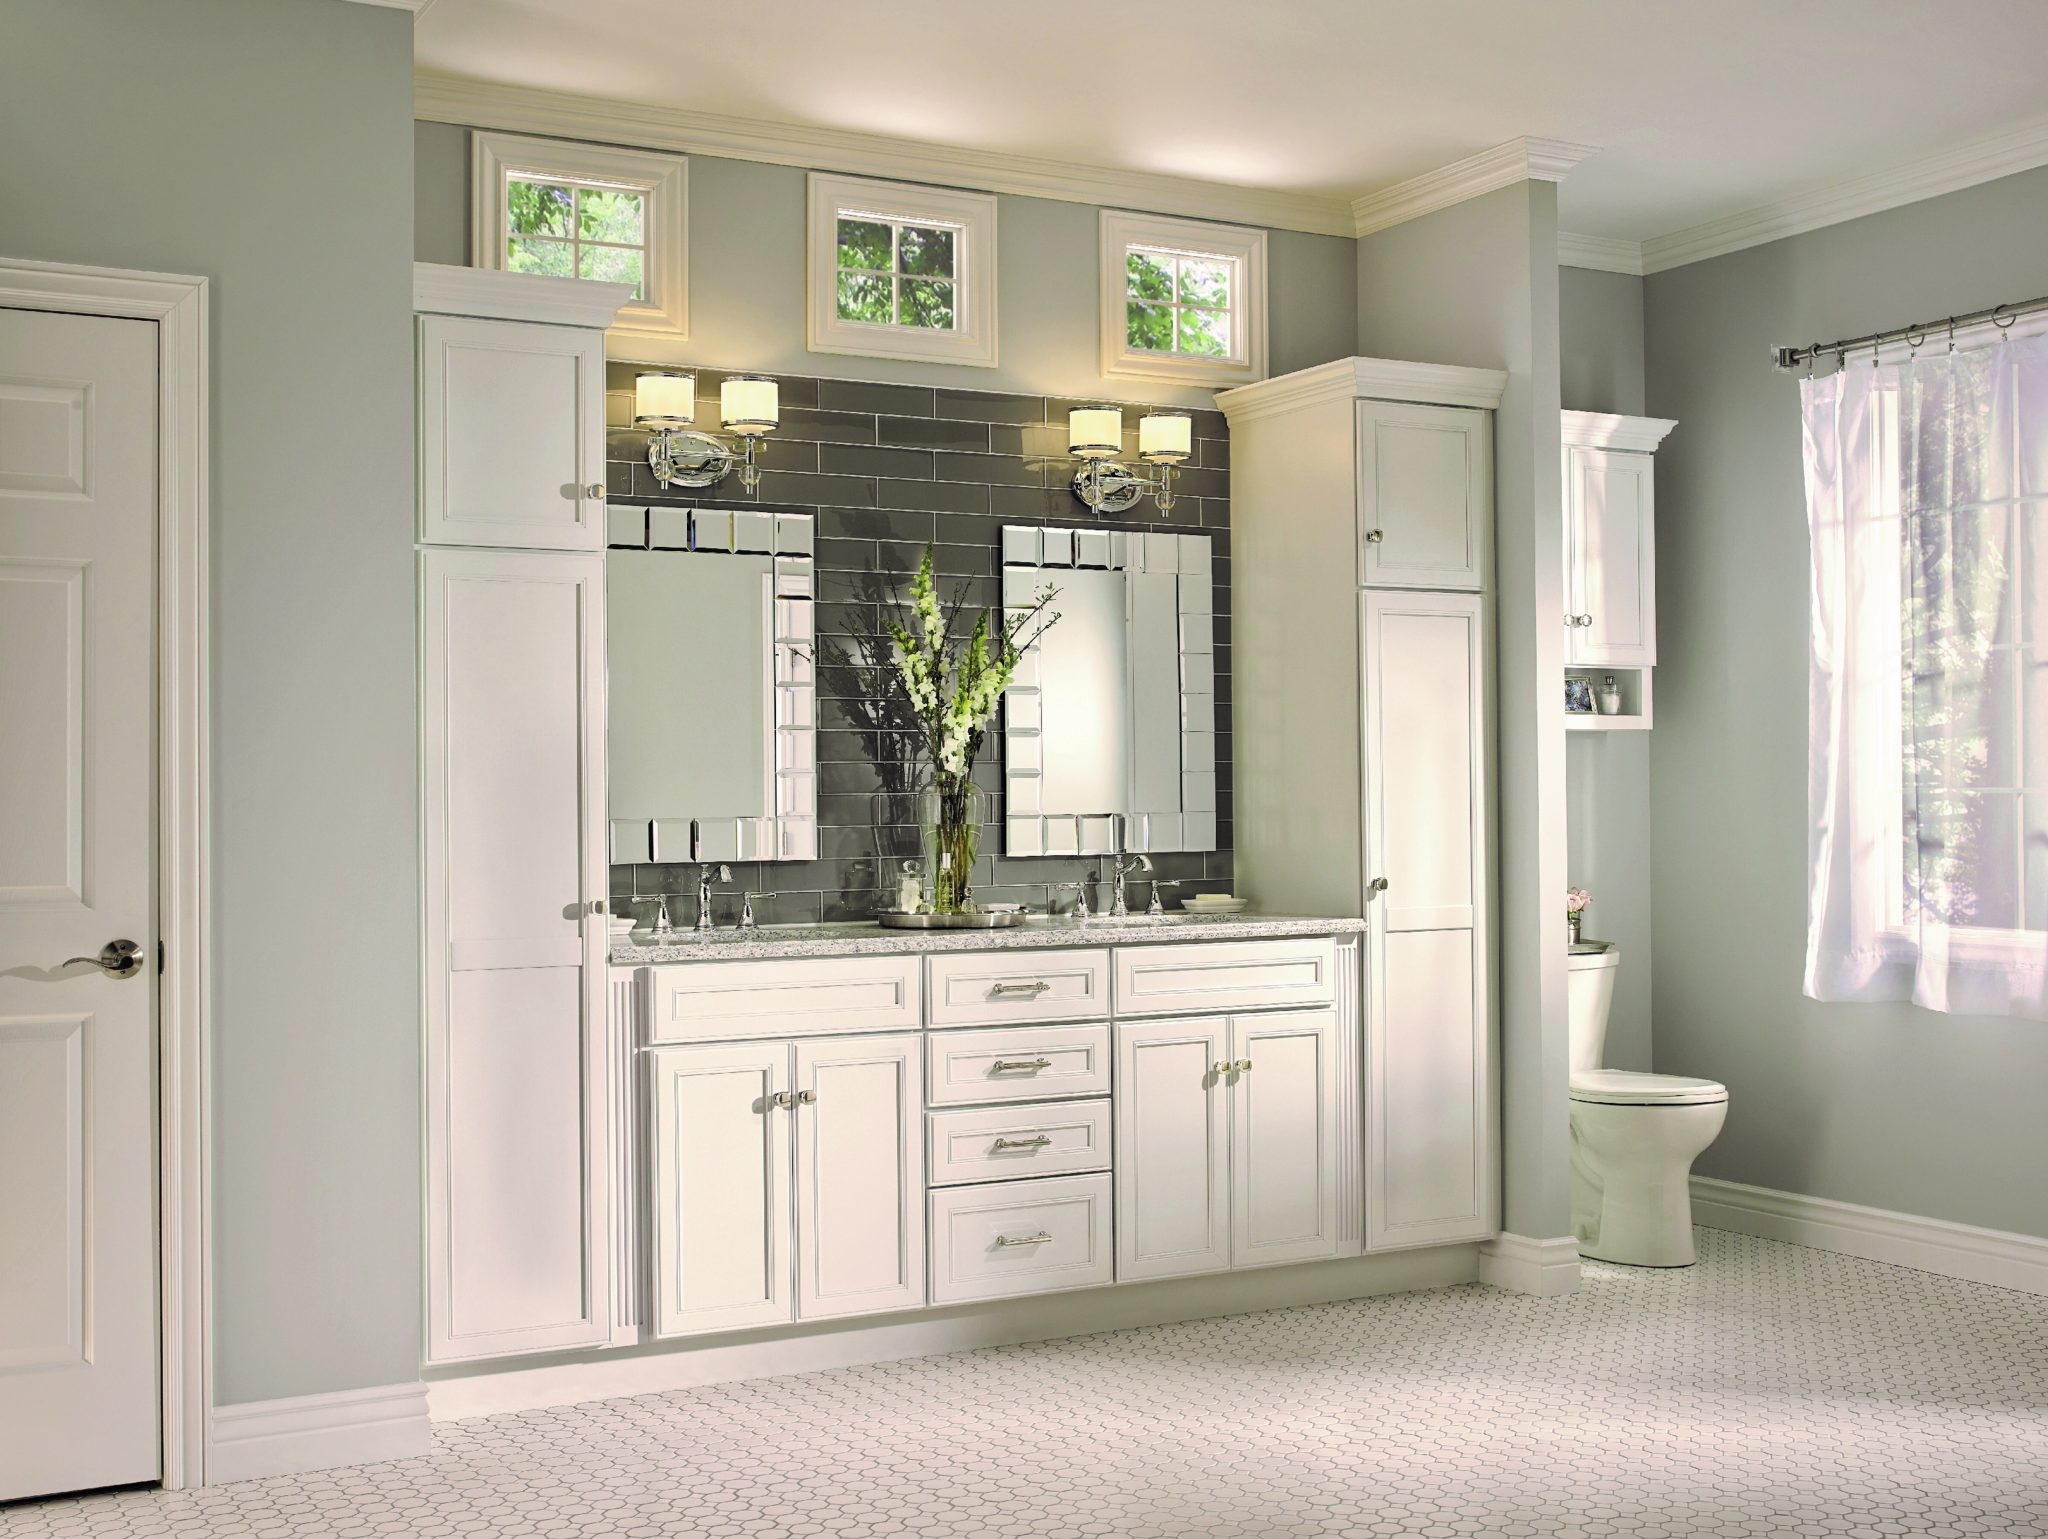 bathroom renovation danbury ct - robertjohnguttkearts